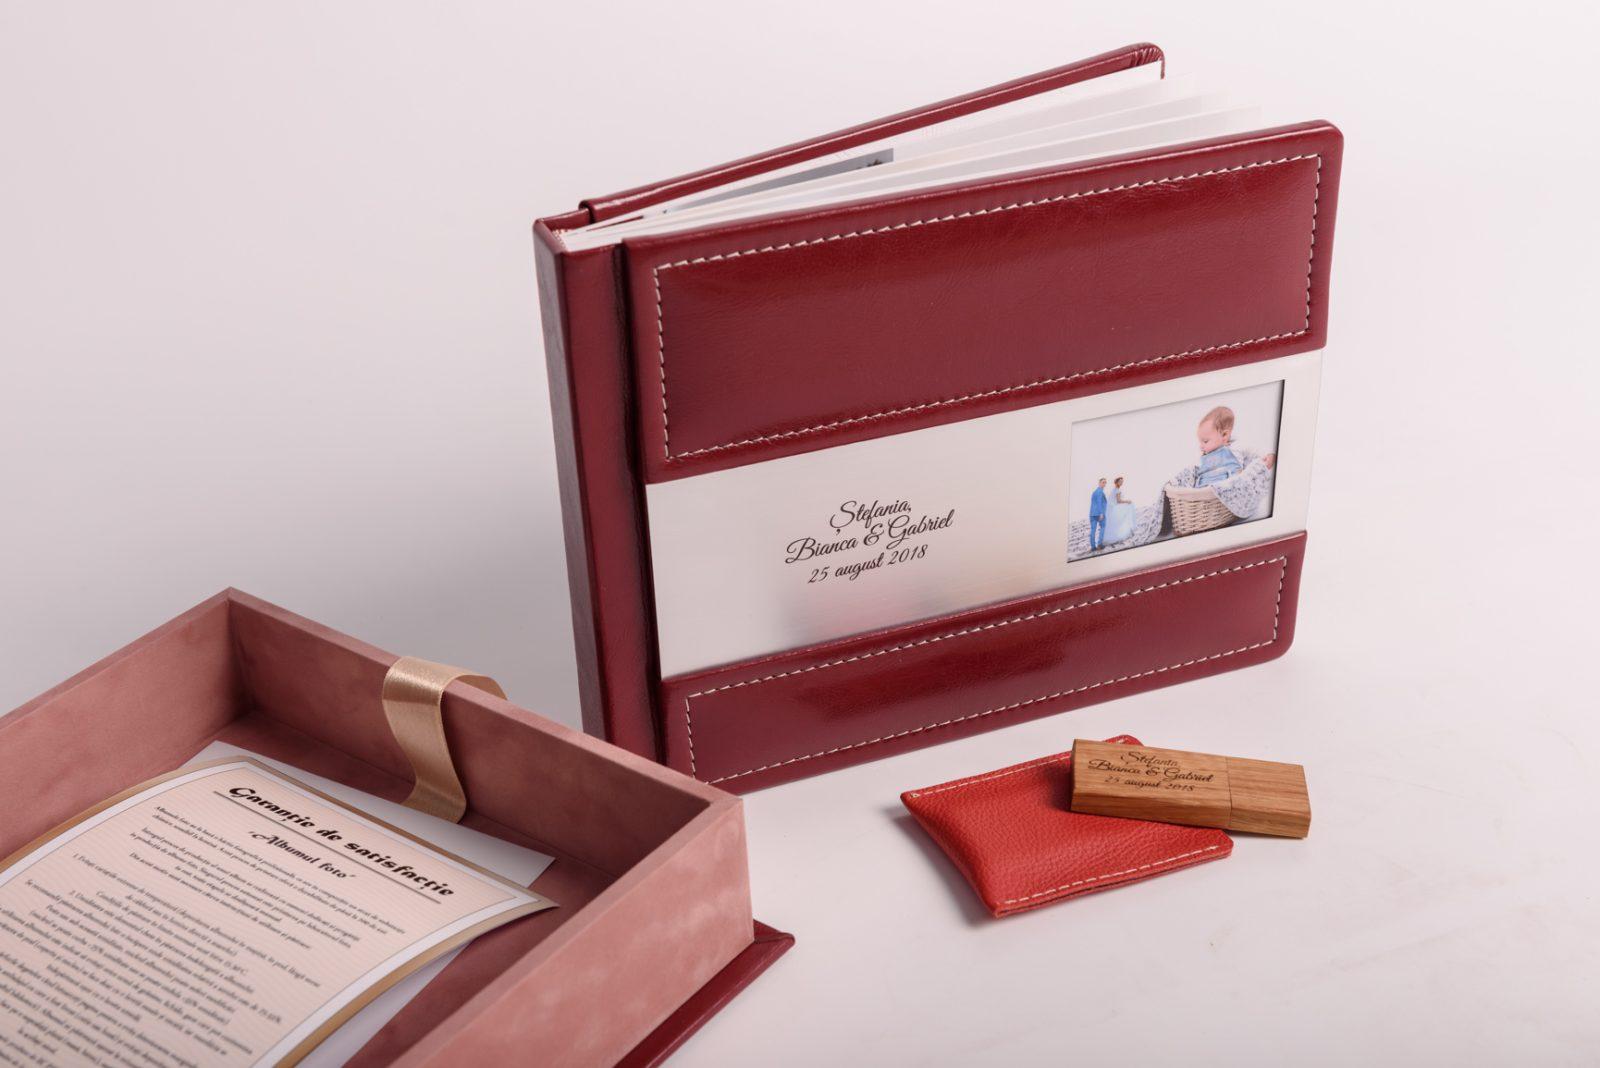 Phtobook 20x25cm - insertie carton 300gr - 20 colaje - piele ecologica + stick USB personalizat si cutie depozitare premium